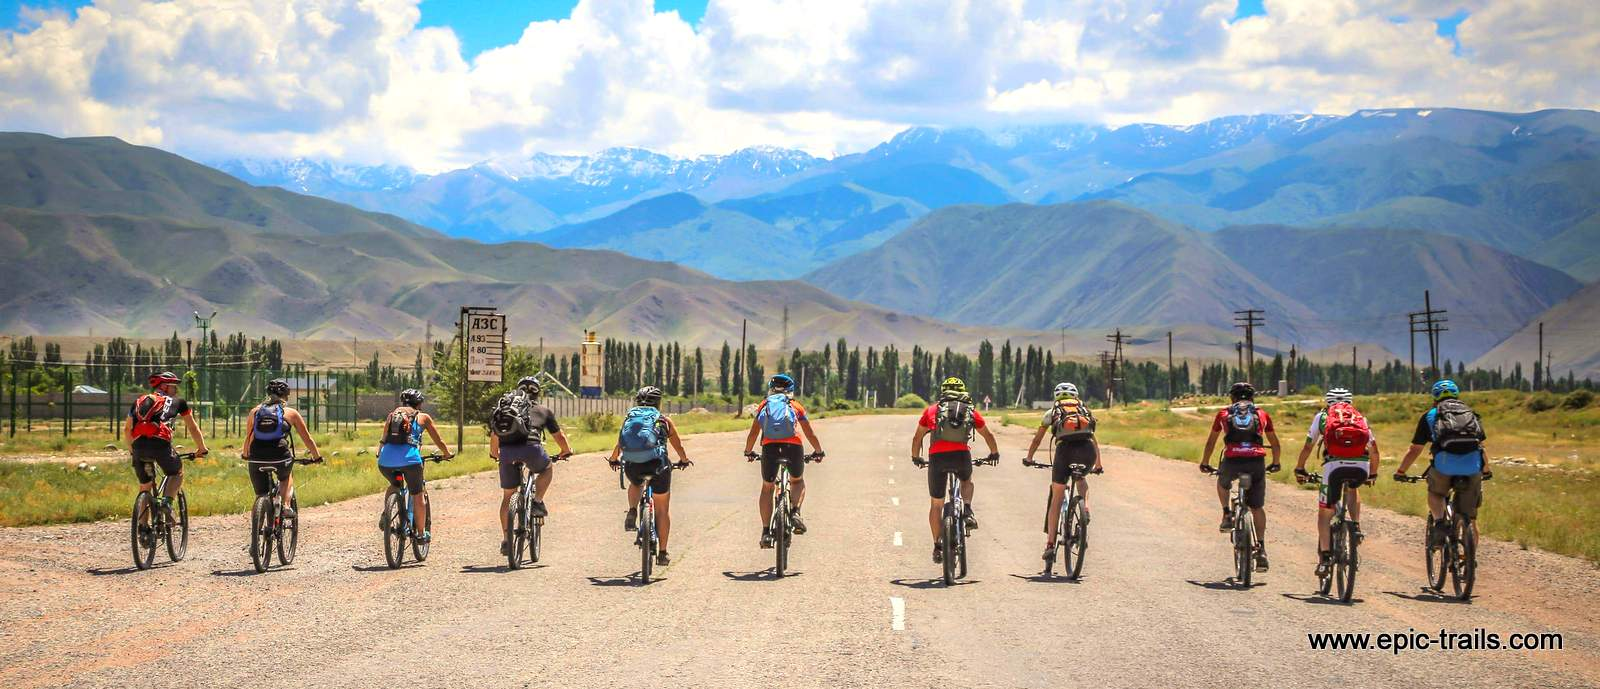 Kirgistan Mountainbike